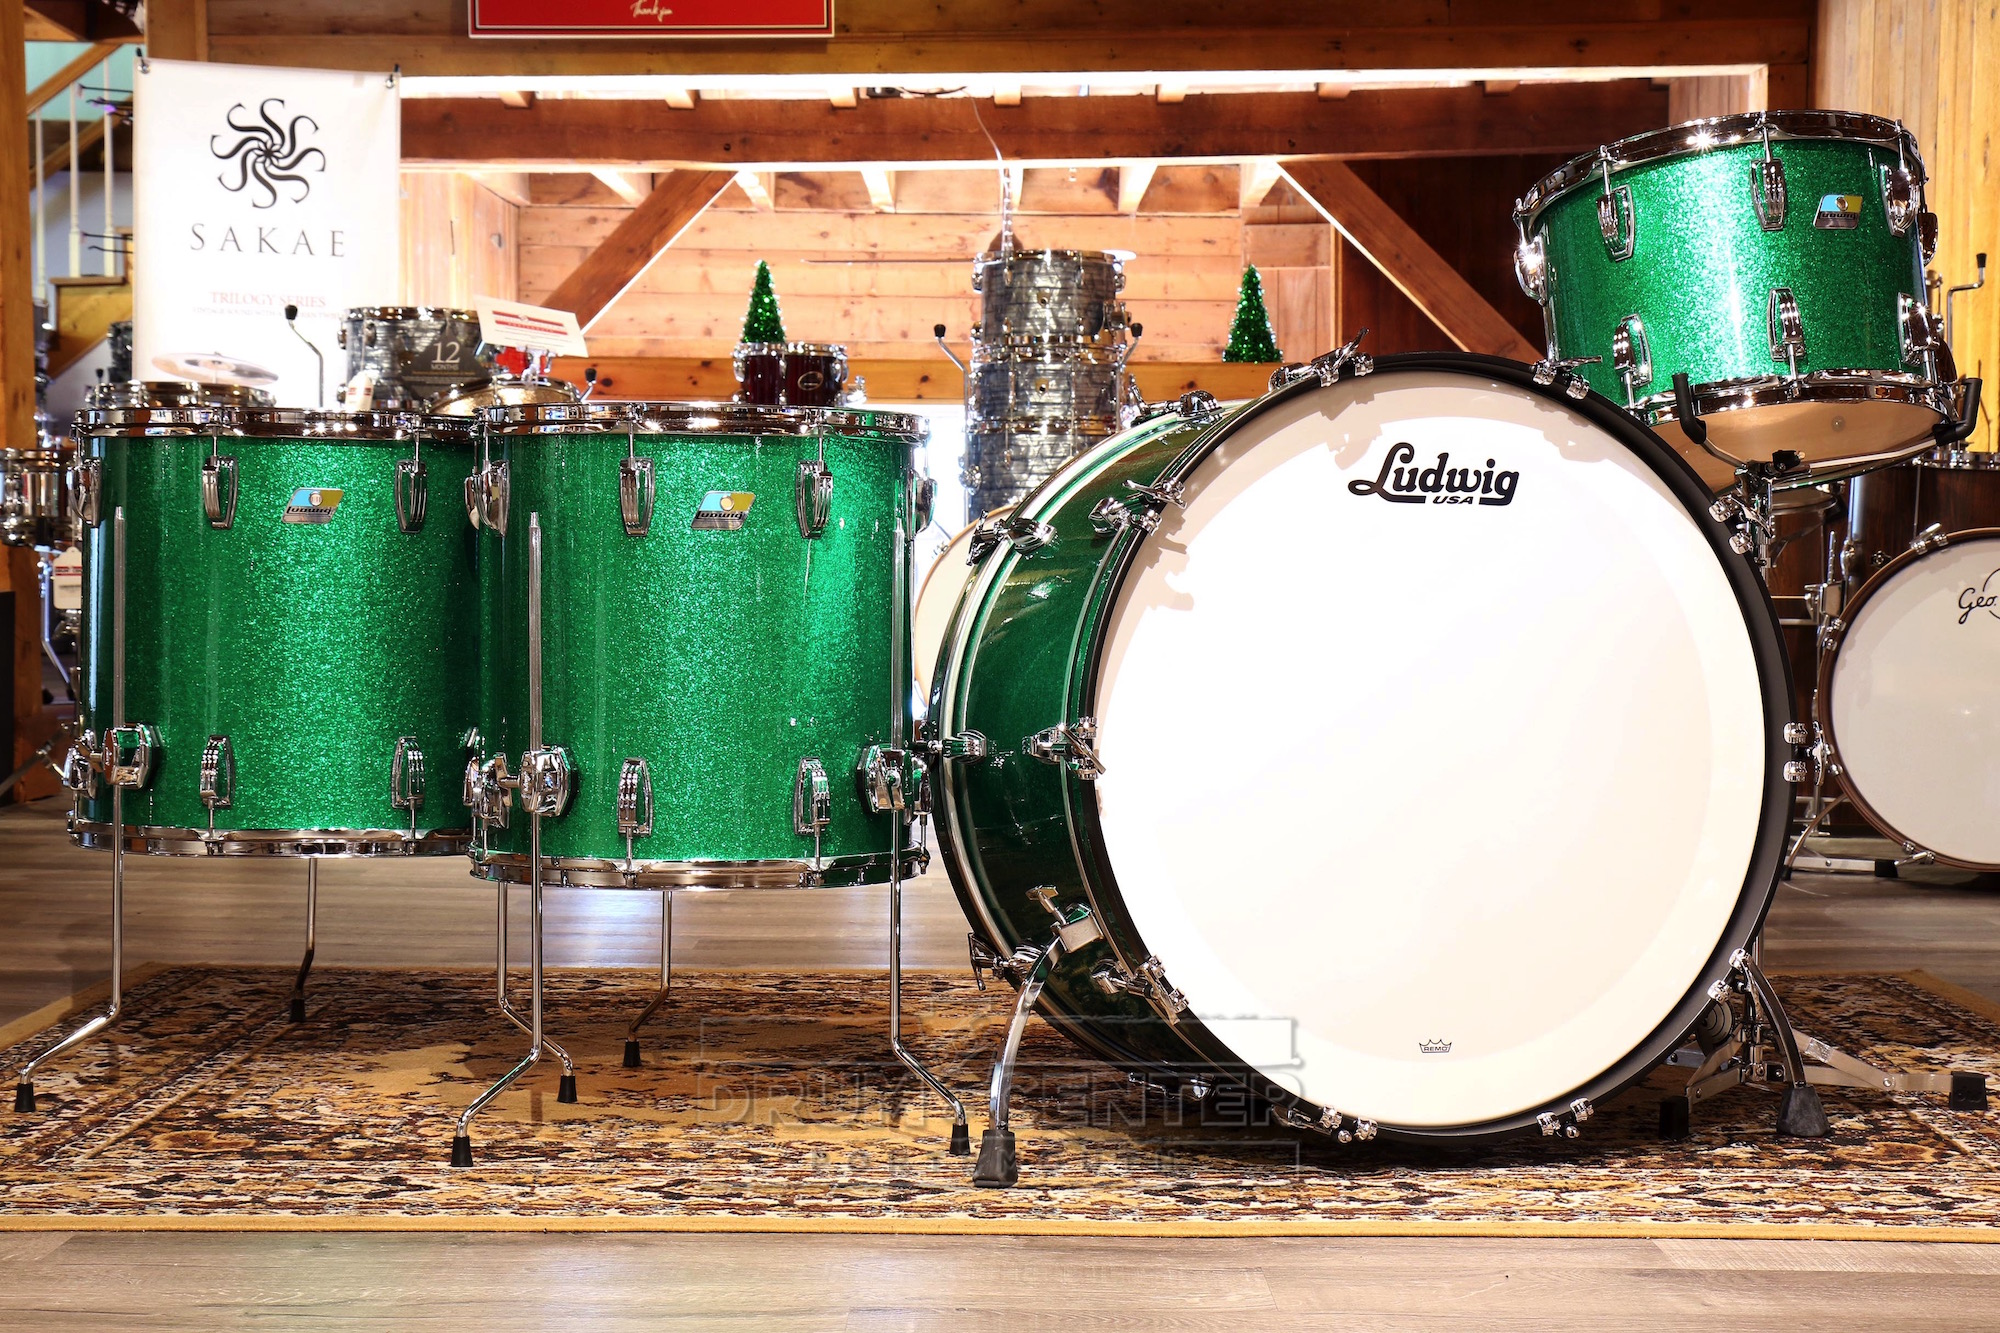 ludwig classic maple 4pc bonham drum set green sparkle video demo ebay. Black Bedroom Furniture Sets. Home Design Ideas